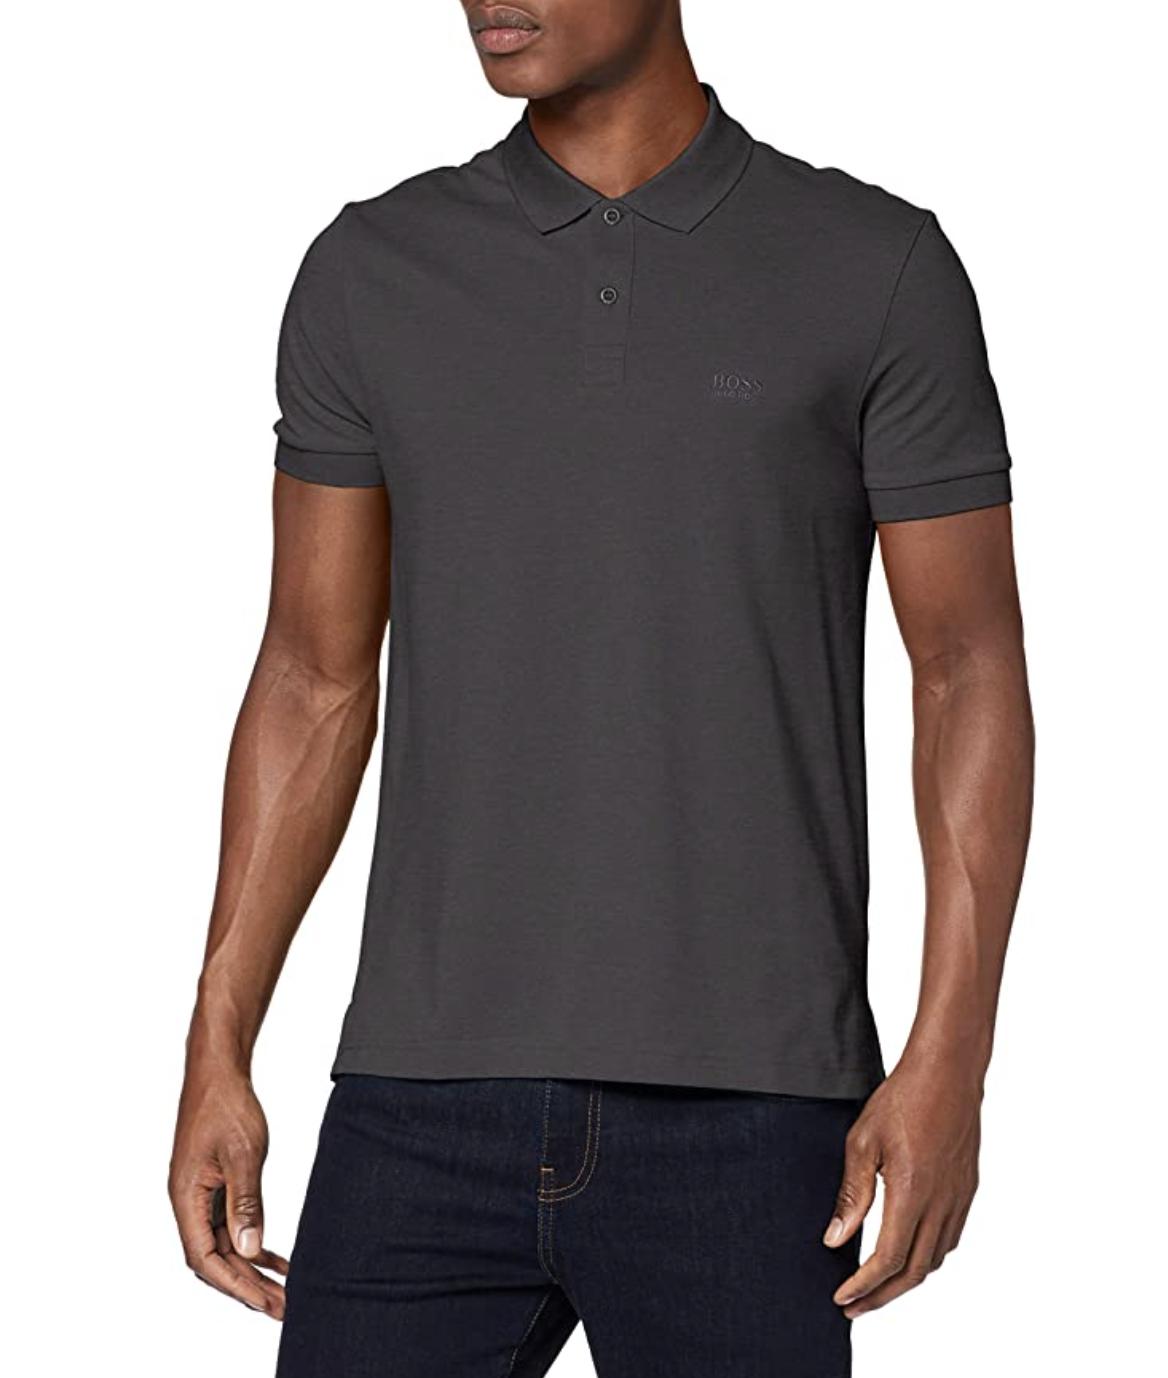 BOSS Men's Piro Polo Shirt Grey, XS - £12.42 Amazon Prime Exclusive @ Amazon